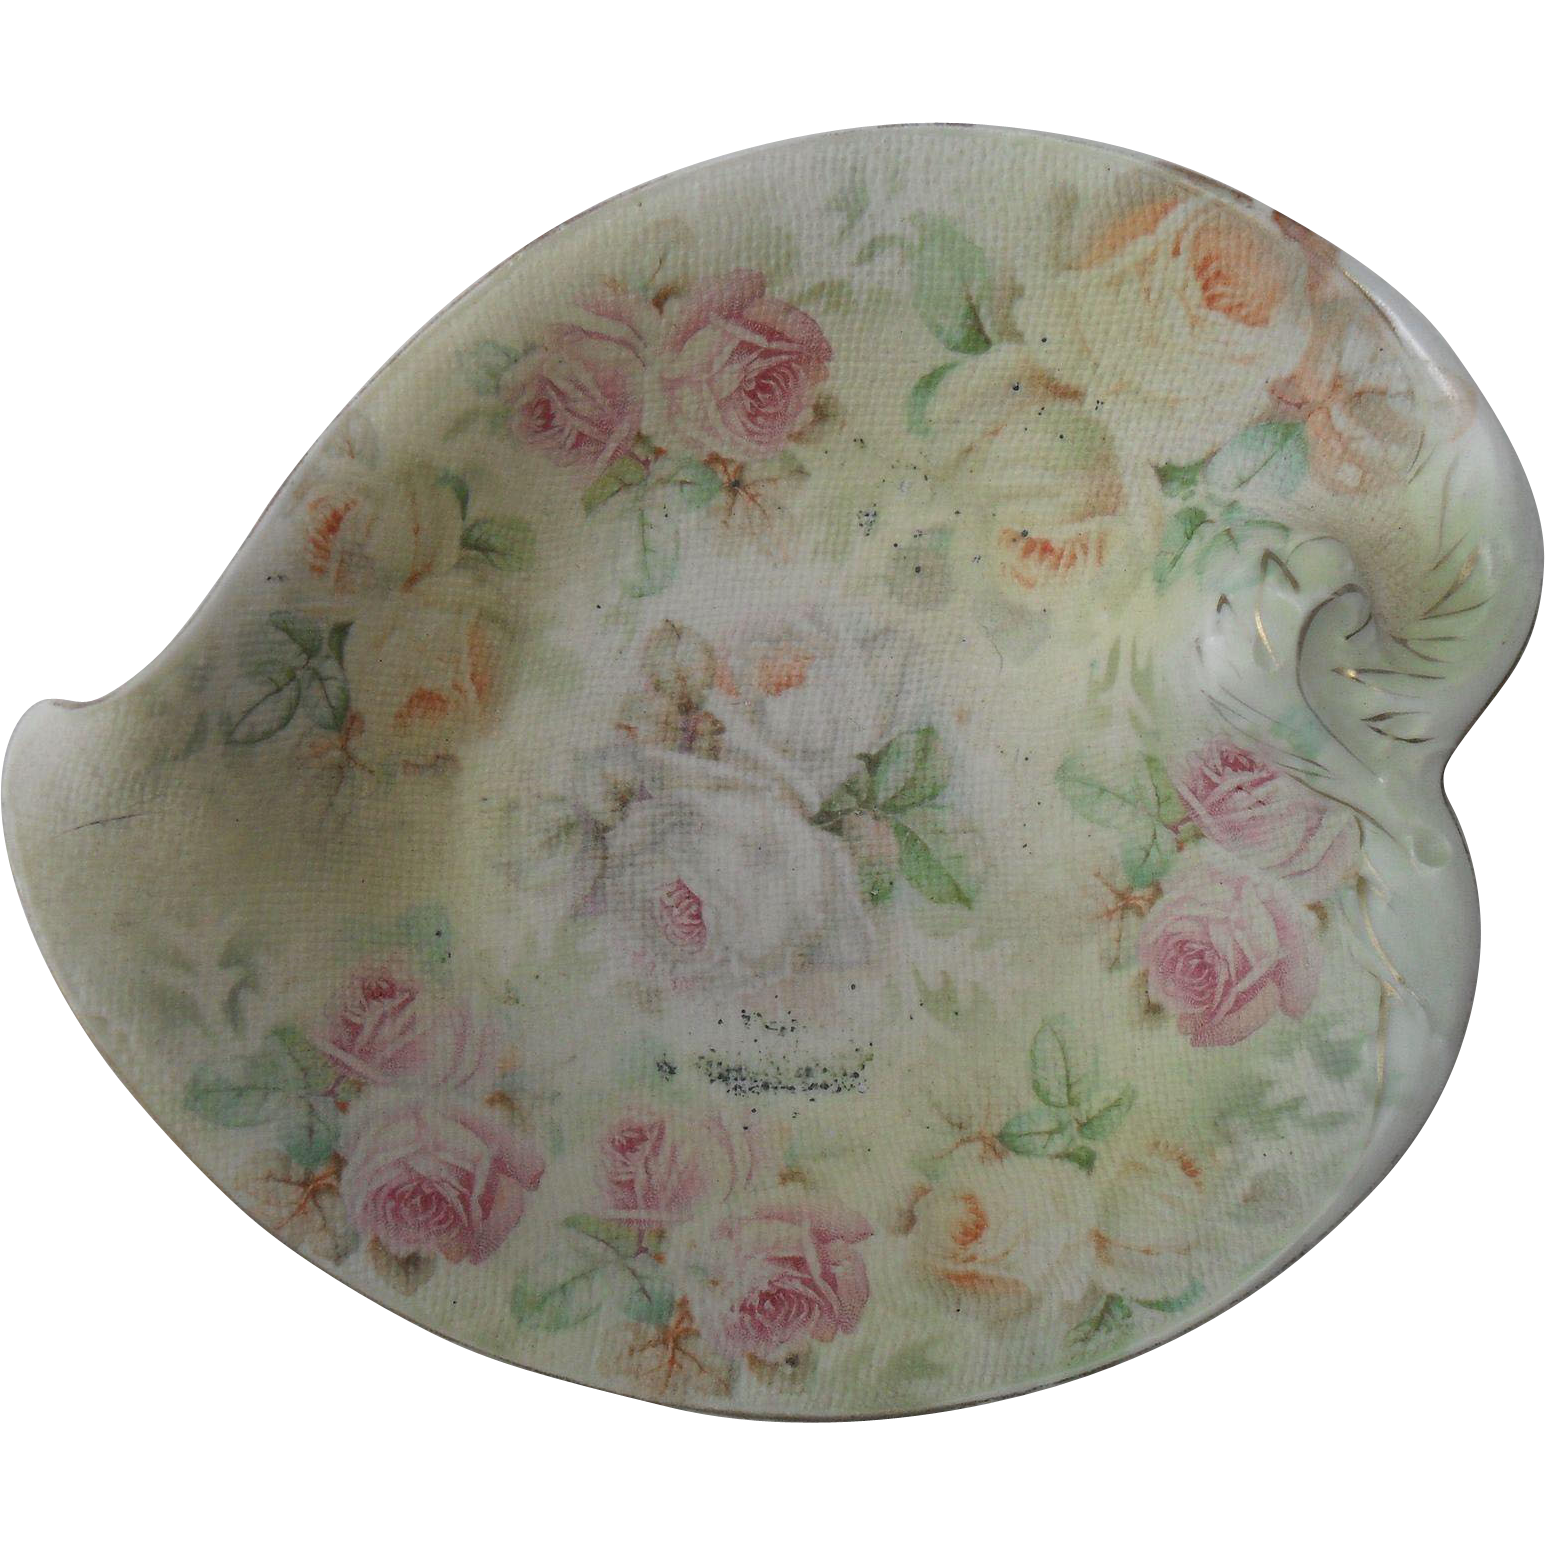 royal bayreuth tapestry rose pin dish from misssmithvt on ruby lane. Black Bedroom Furniture Sets. Home Design Ideas